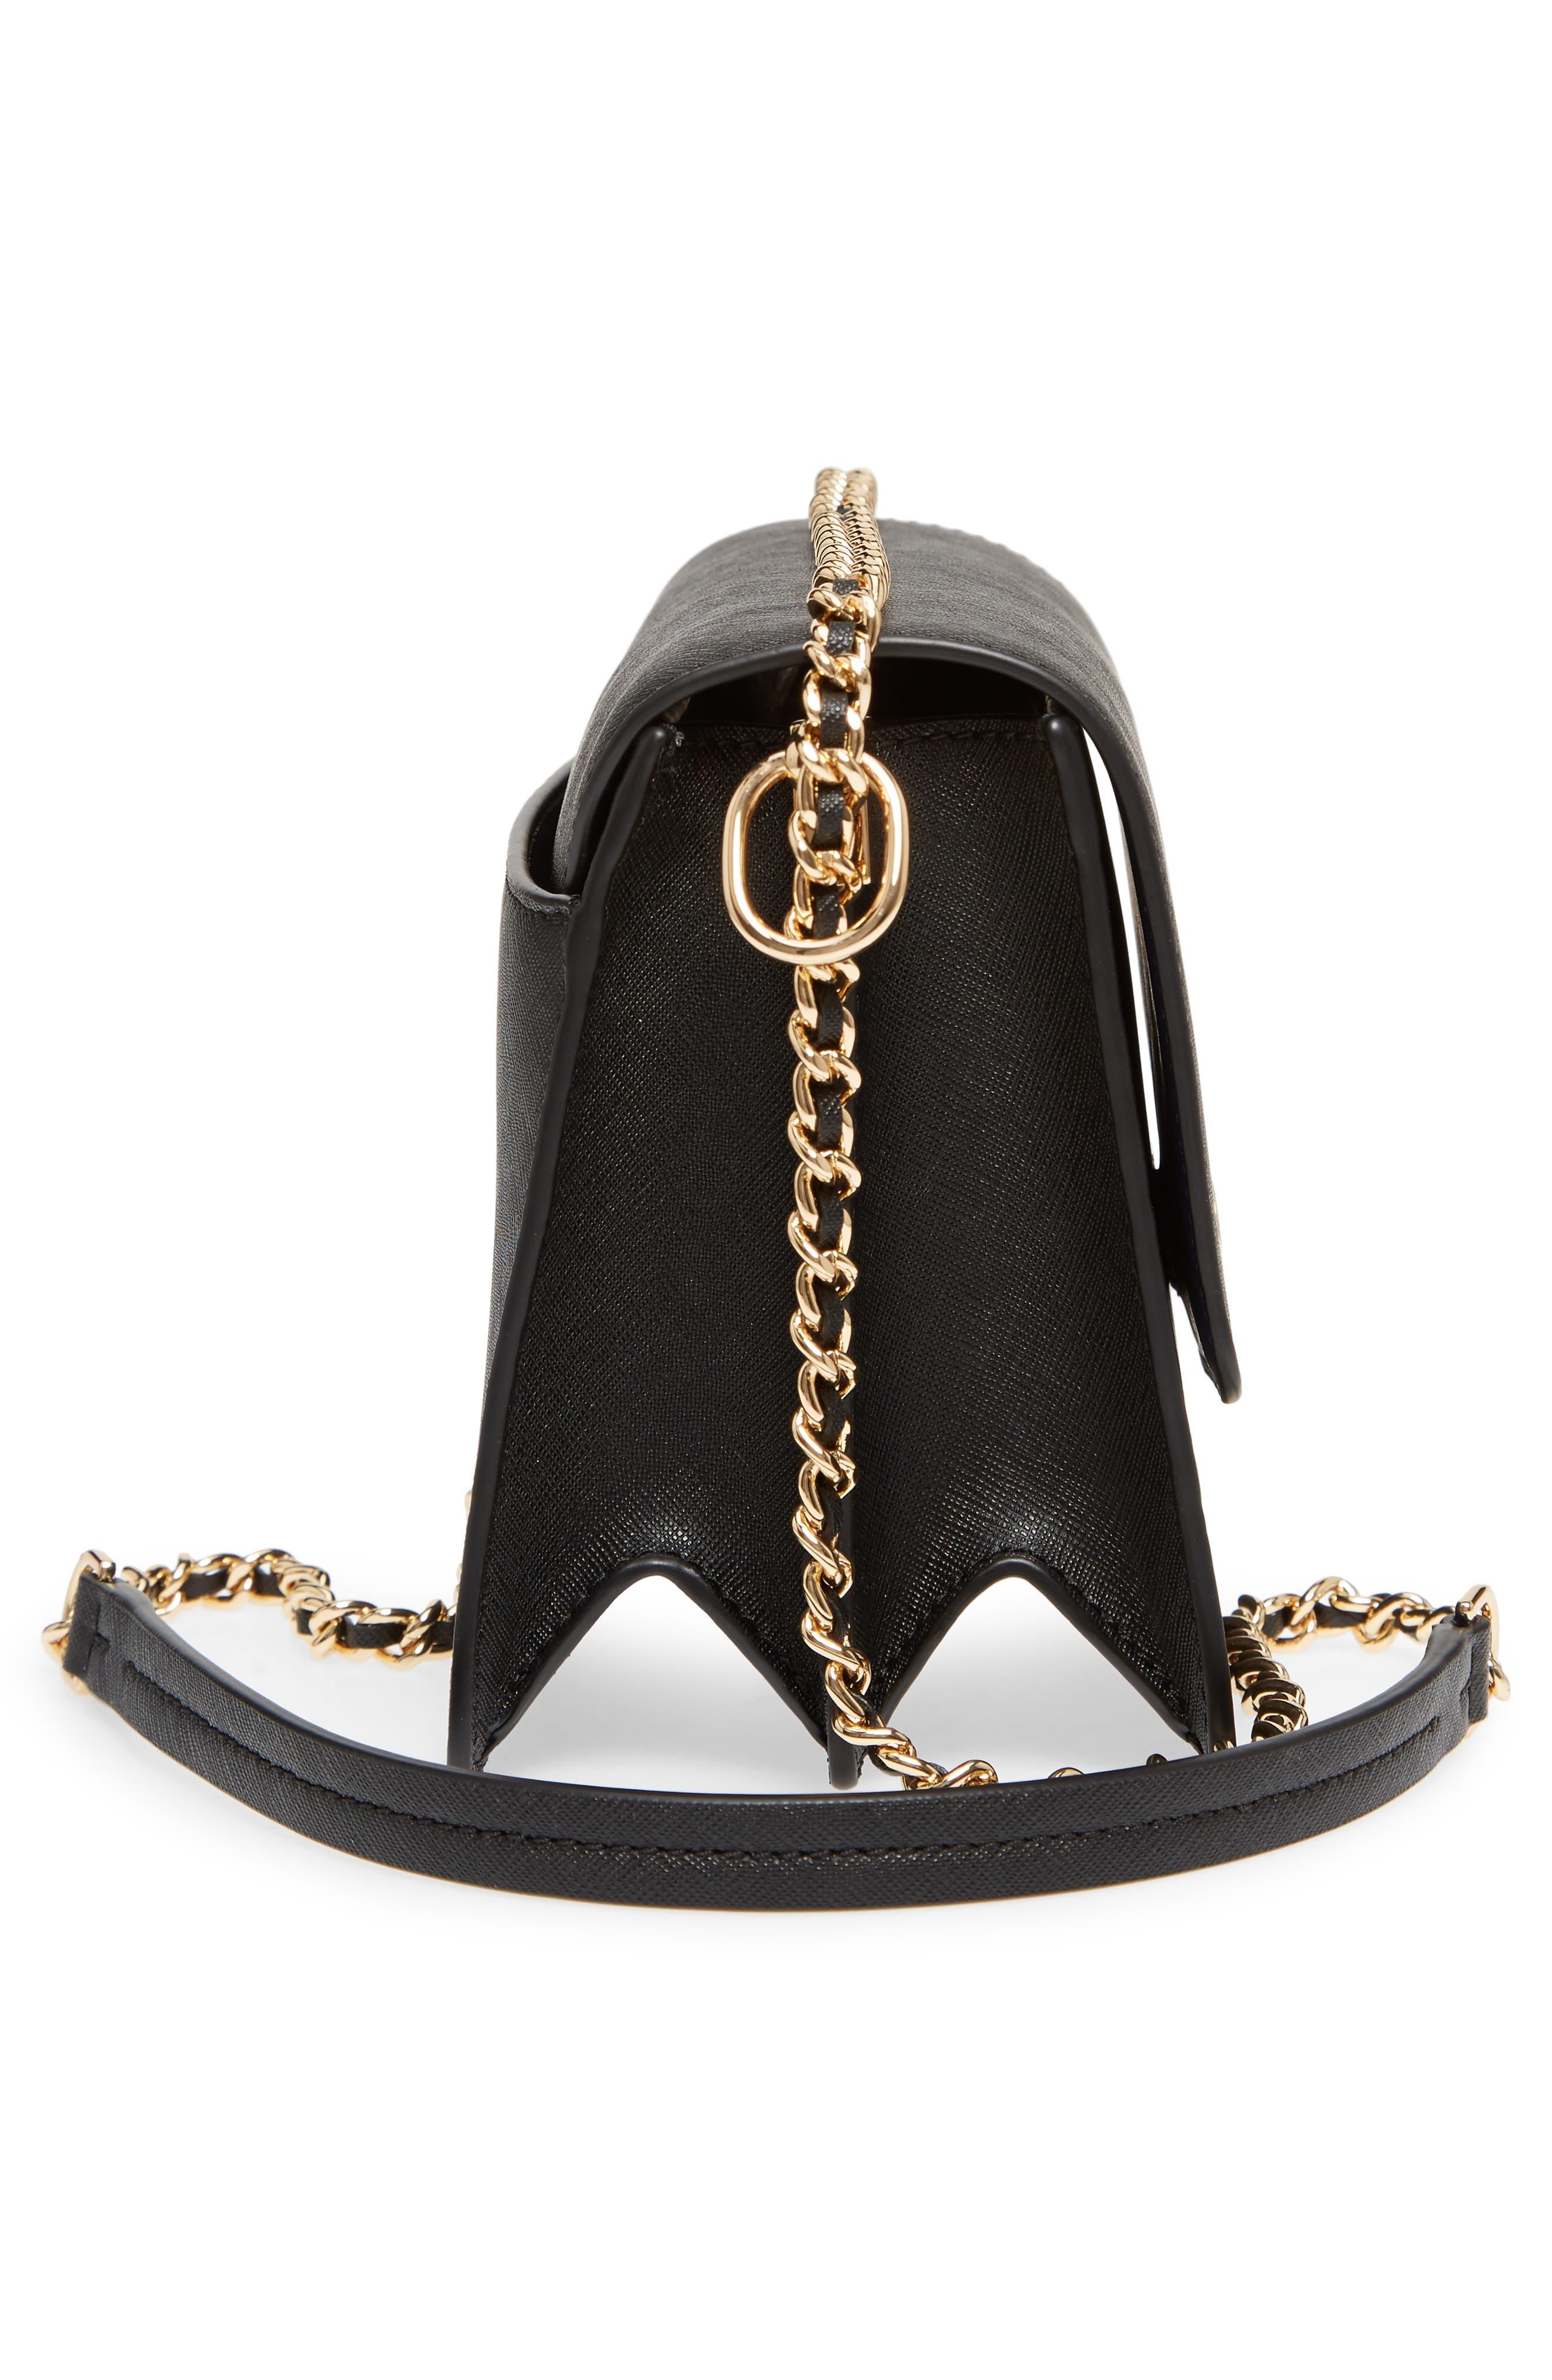 Robinson Convertible Leather Shoulder Bag,                             Alternate thumbnail 5, color,                             BLACK / ROYAL NAVY